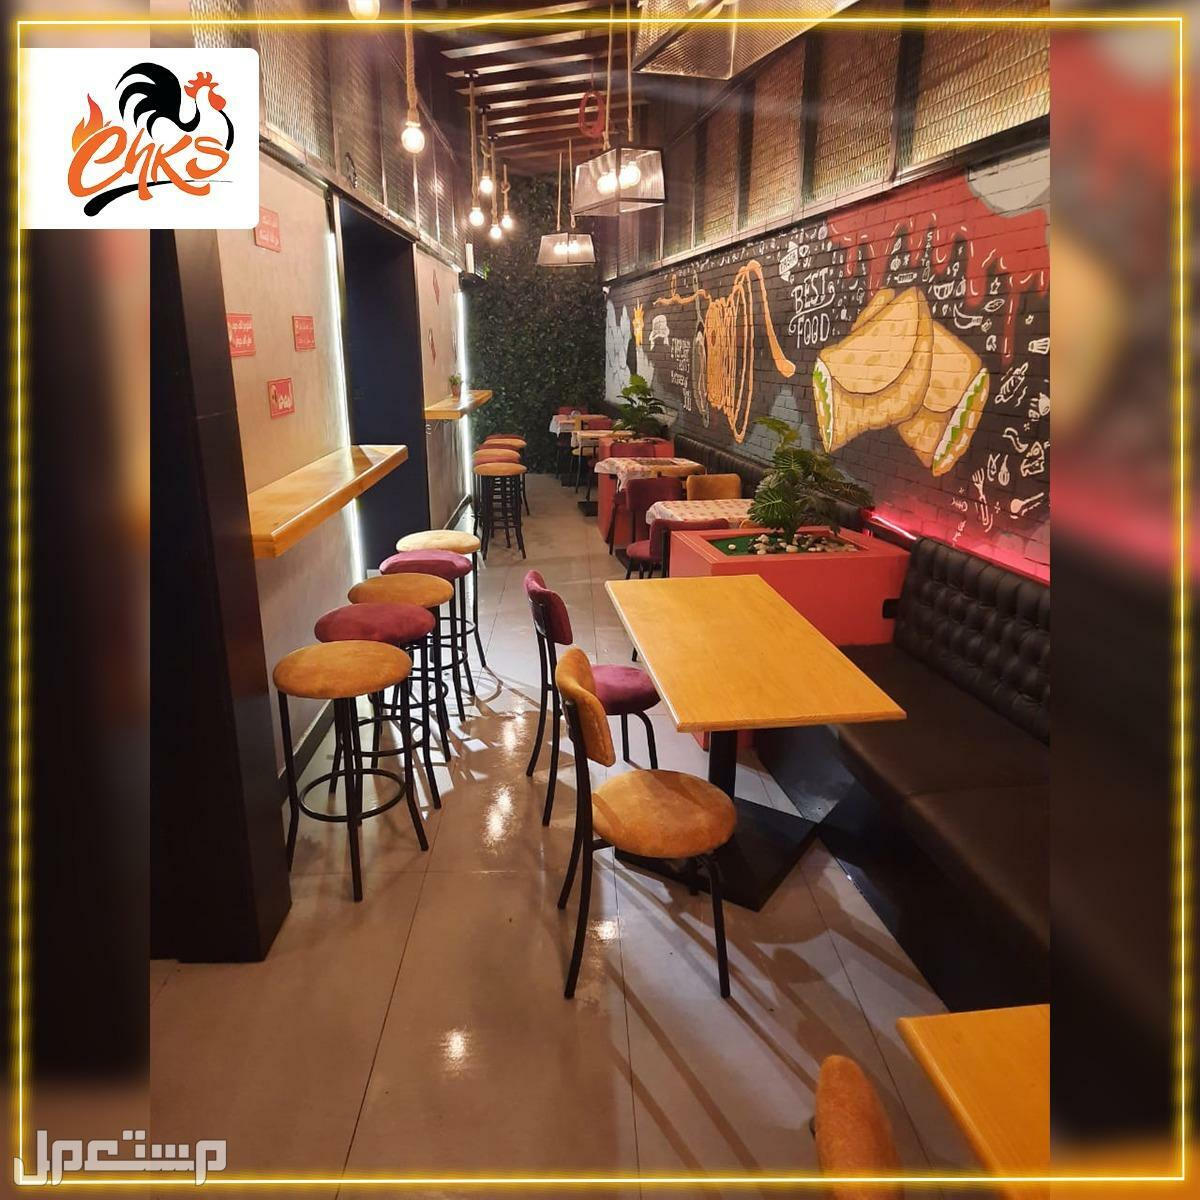 فرصه استثمار مطعم مغريه جدا في مصر